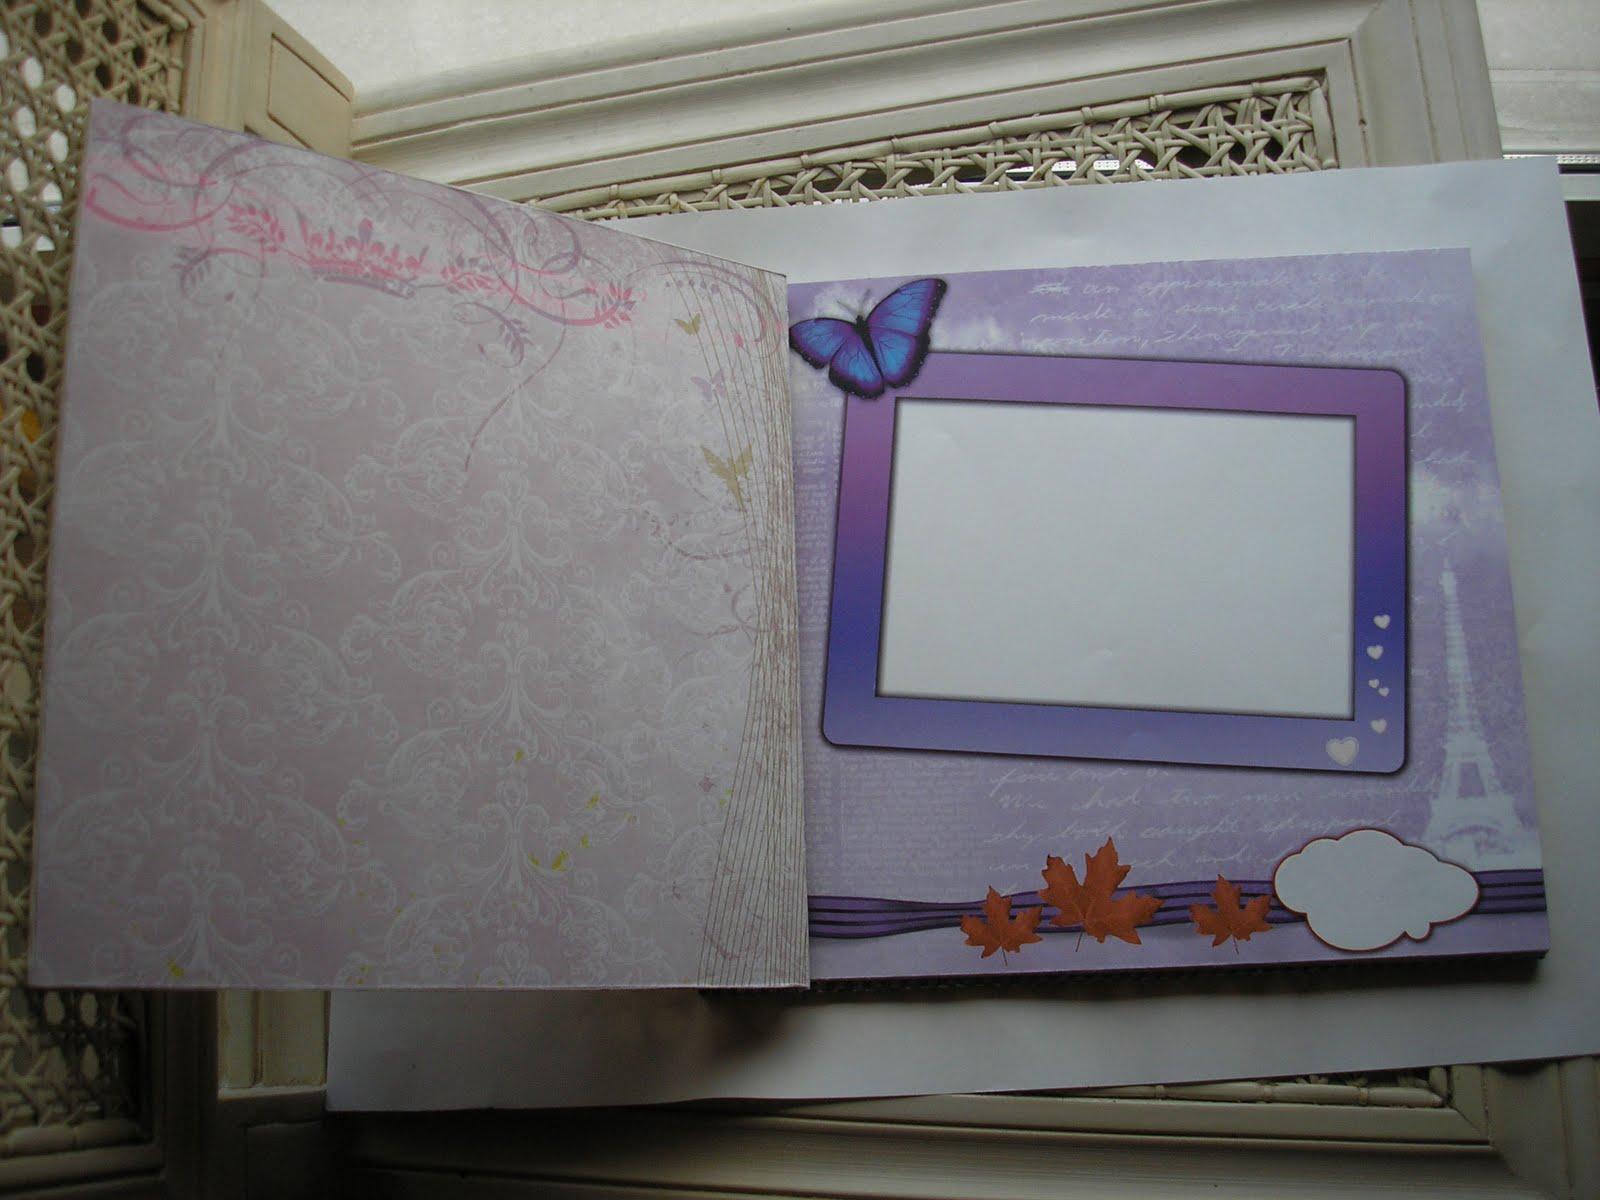 Como decorar un album de fotos por dentro imagui - Decorar album de fotos ...